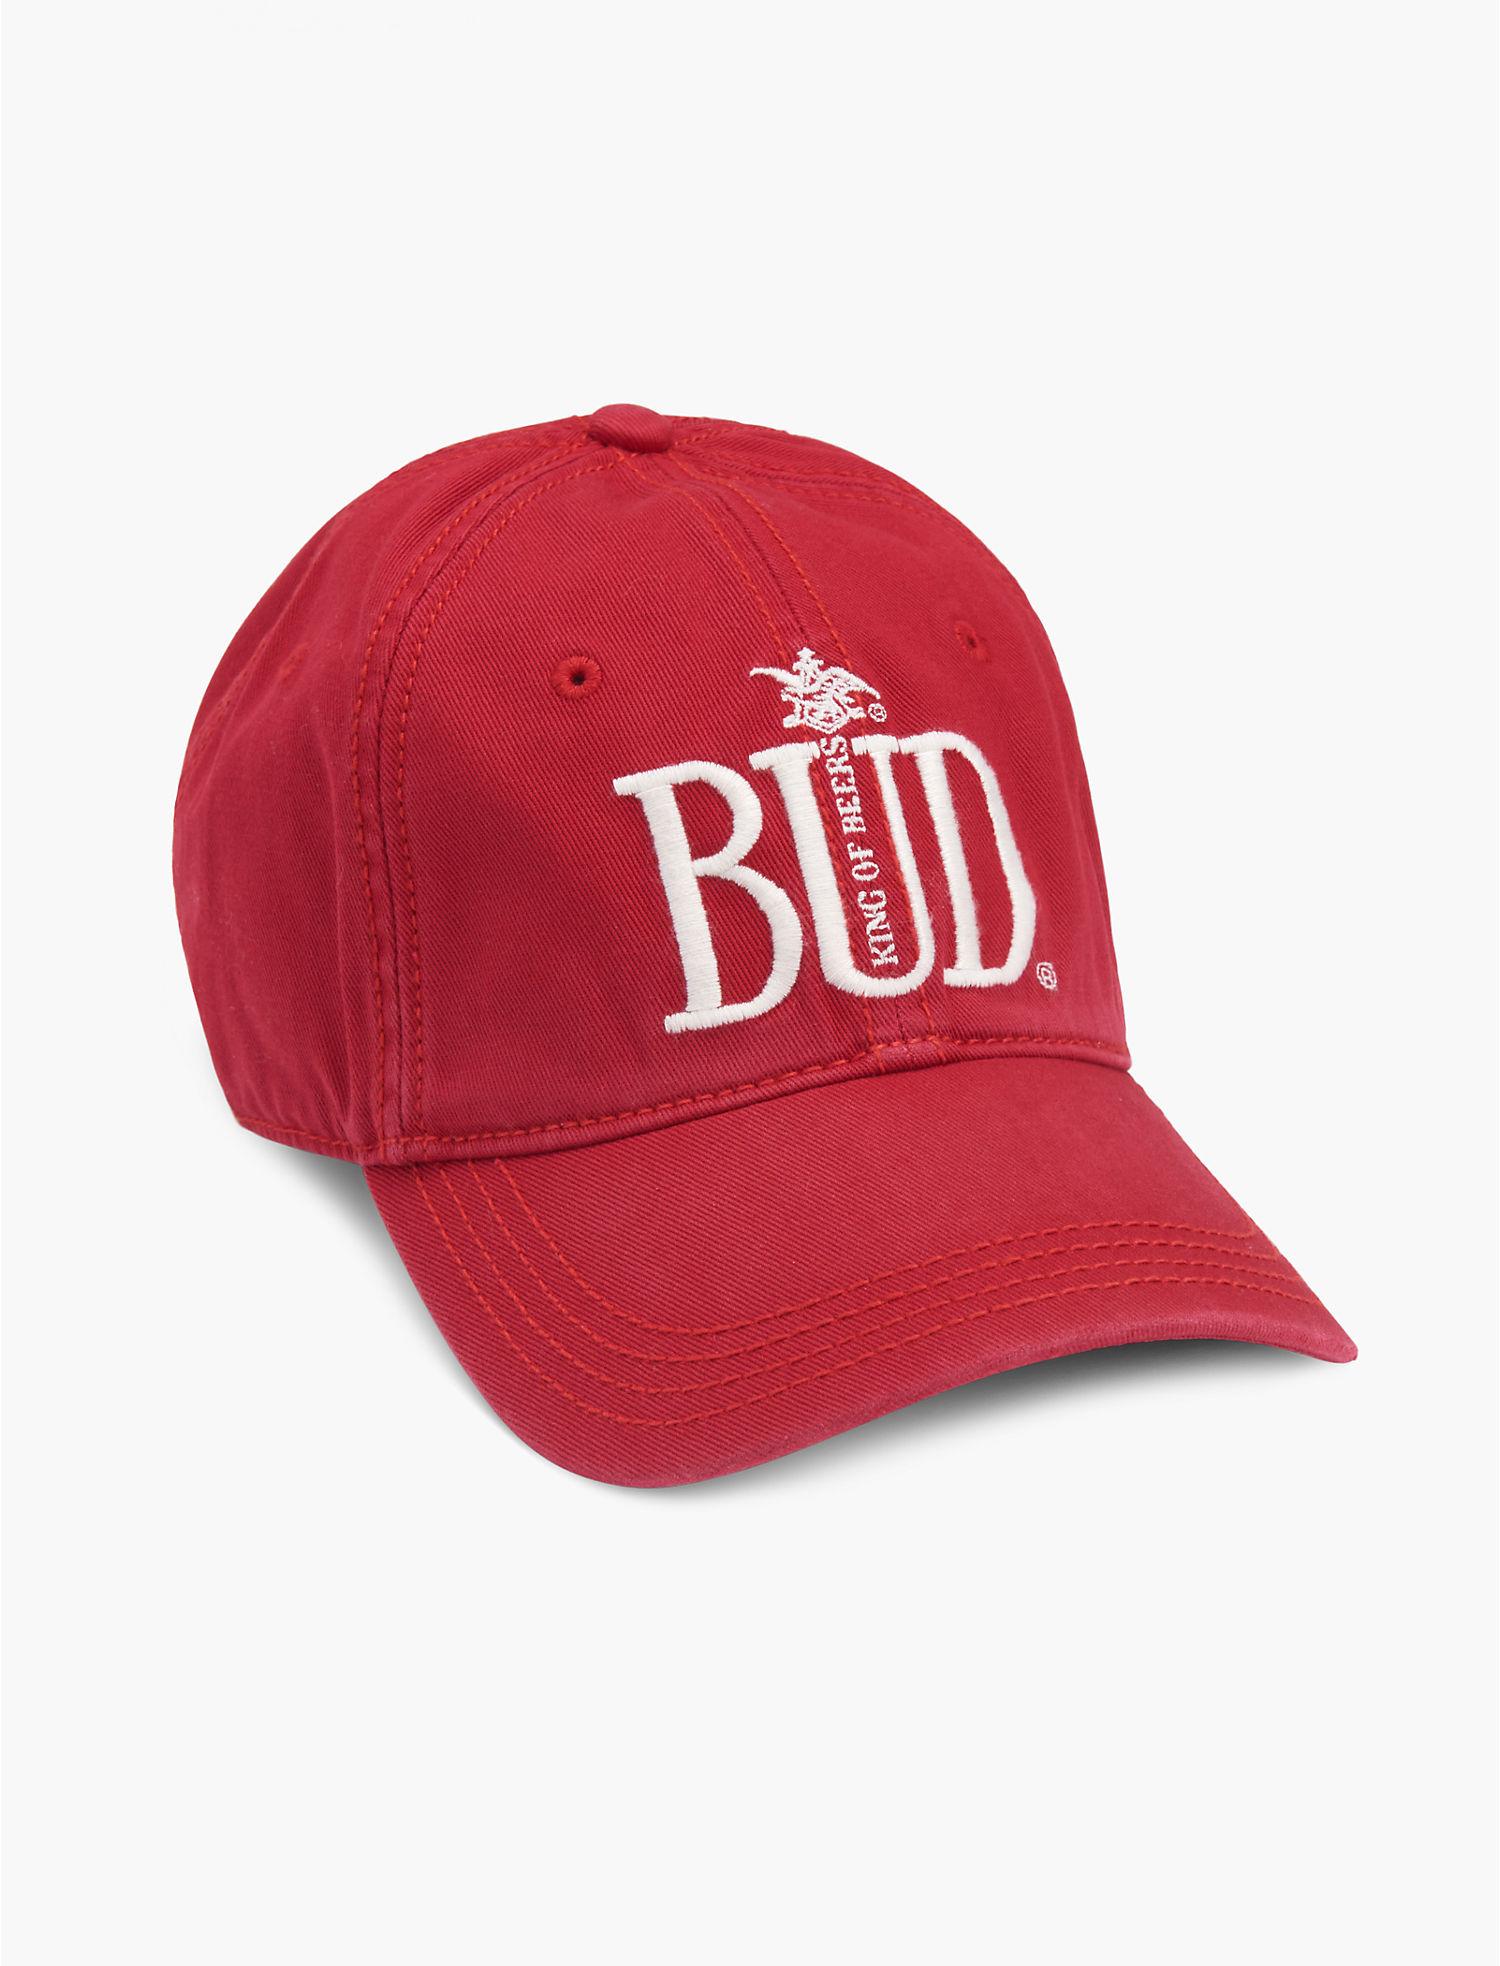 BUDWEISER BASEBALL HAT - Lucky Brand - Canada 36dfea63bfd8